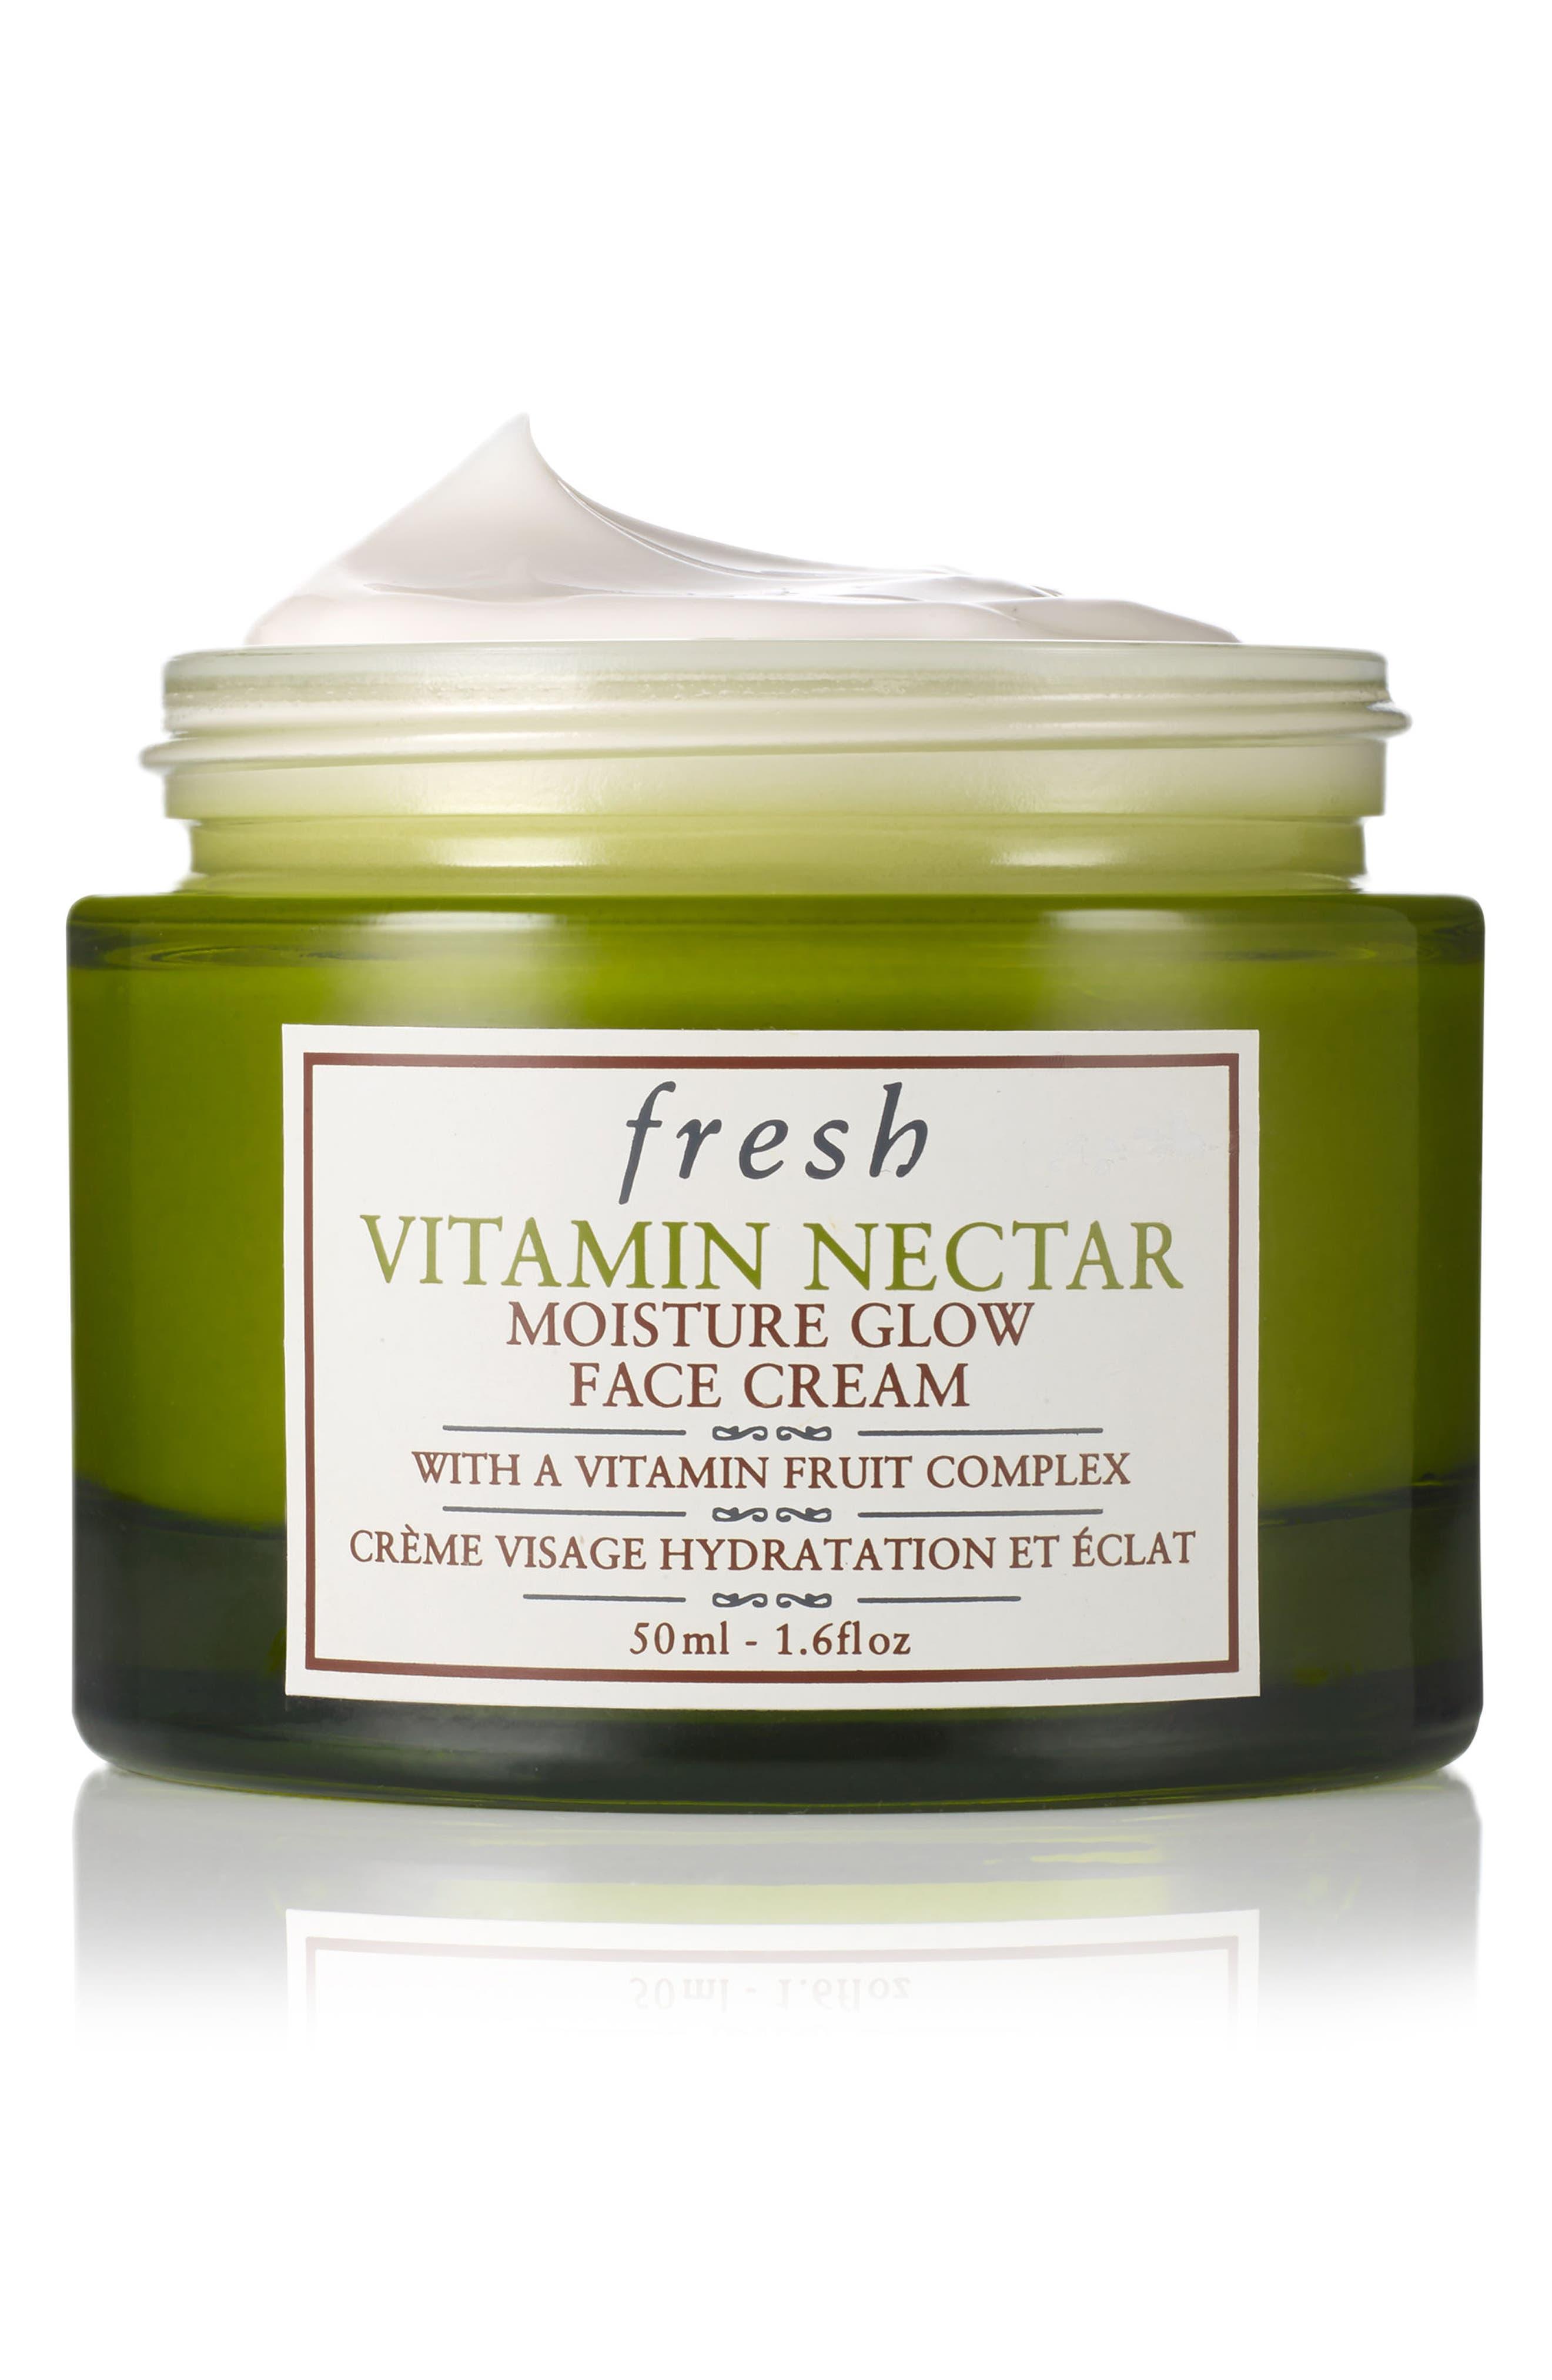 Vitamin Nectar Moisture Glow Face Cream,                         Main,                         color, No Color